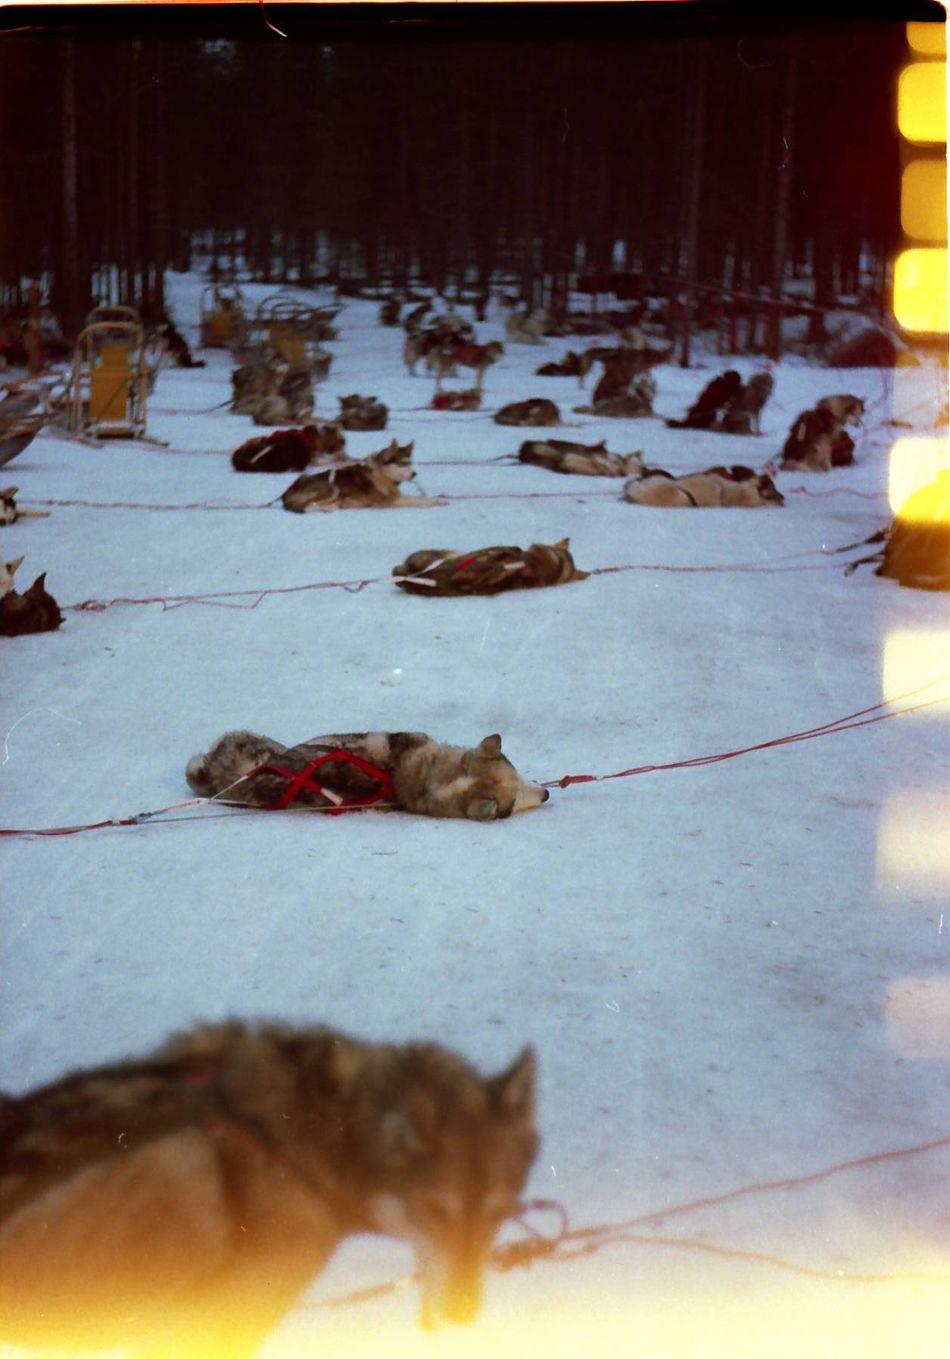 Dogs Sleeping Sleep Winter Snow Rest Sledge Dog Film Film Photography Zenit Analog Showcase: February FinlandsWinter Finland Poetic Color Photography